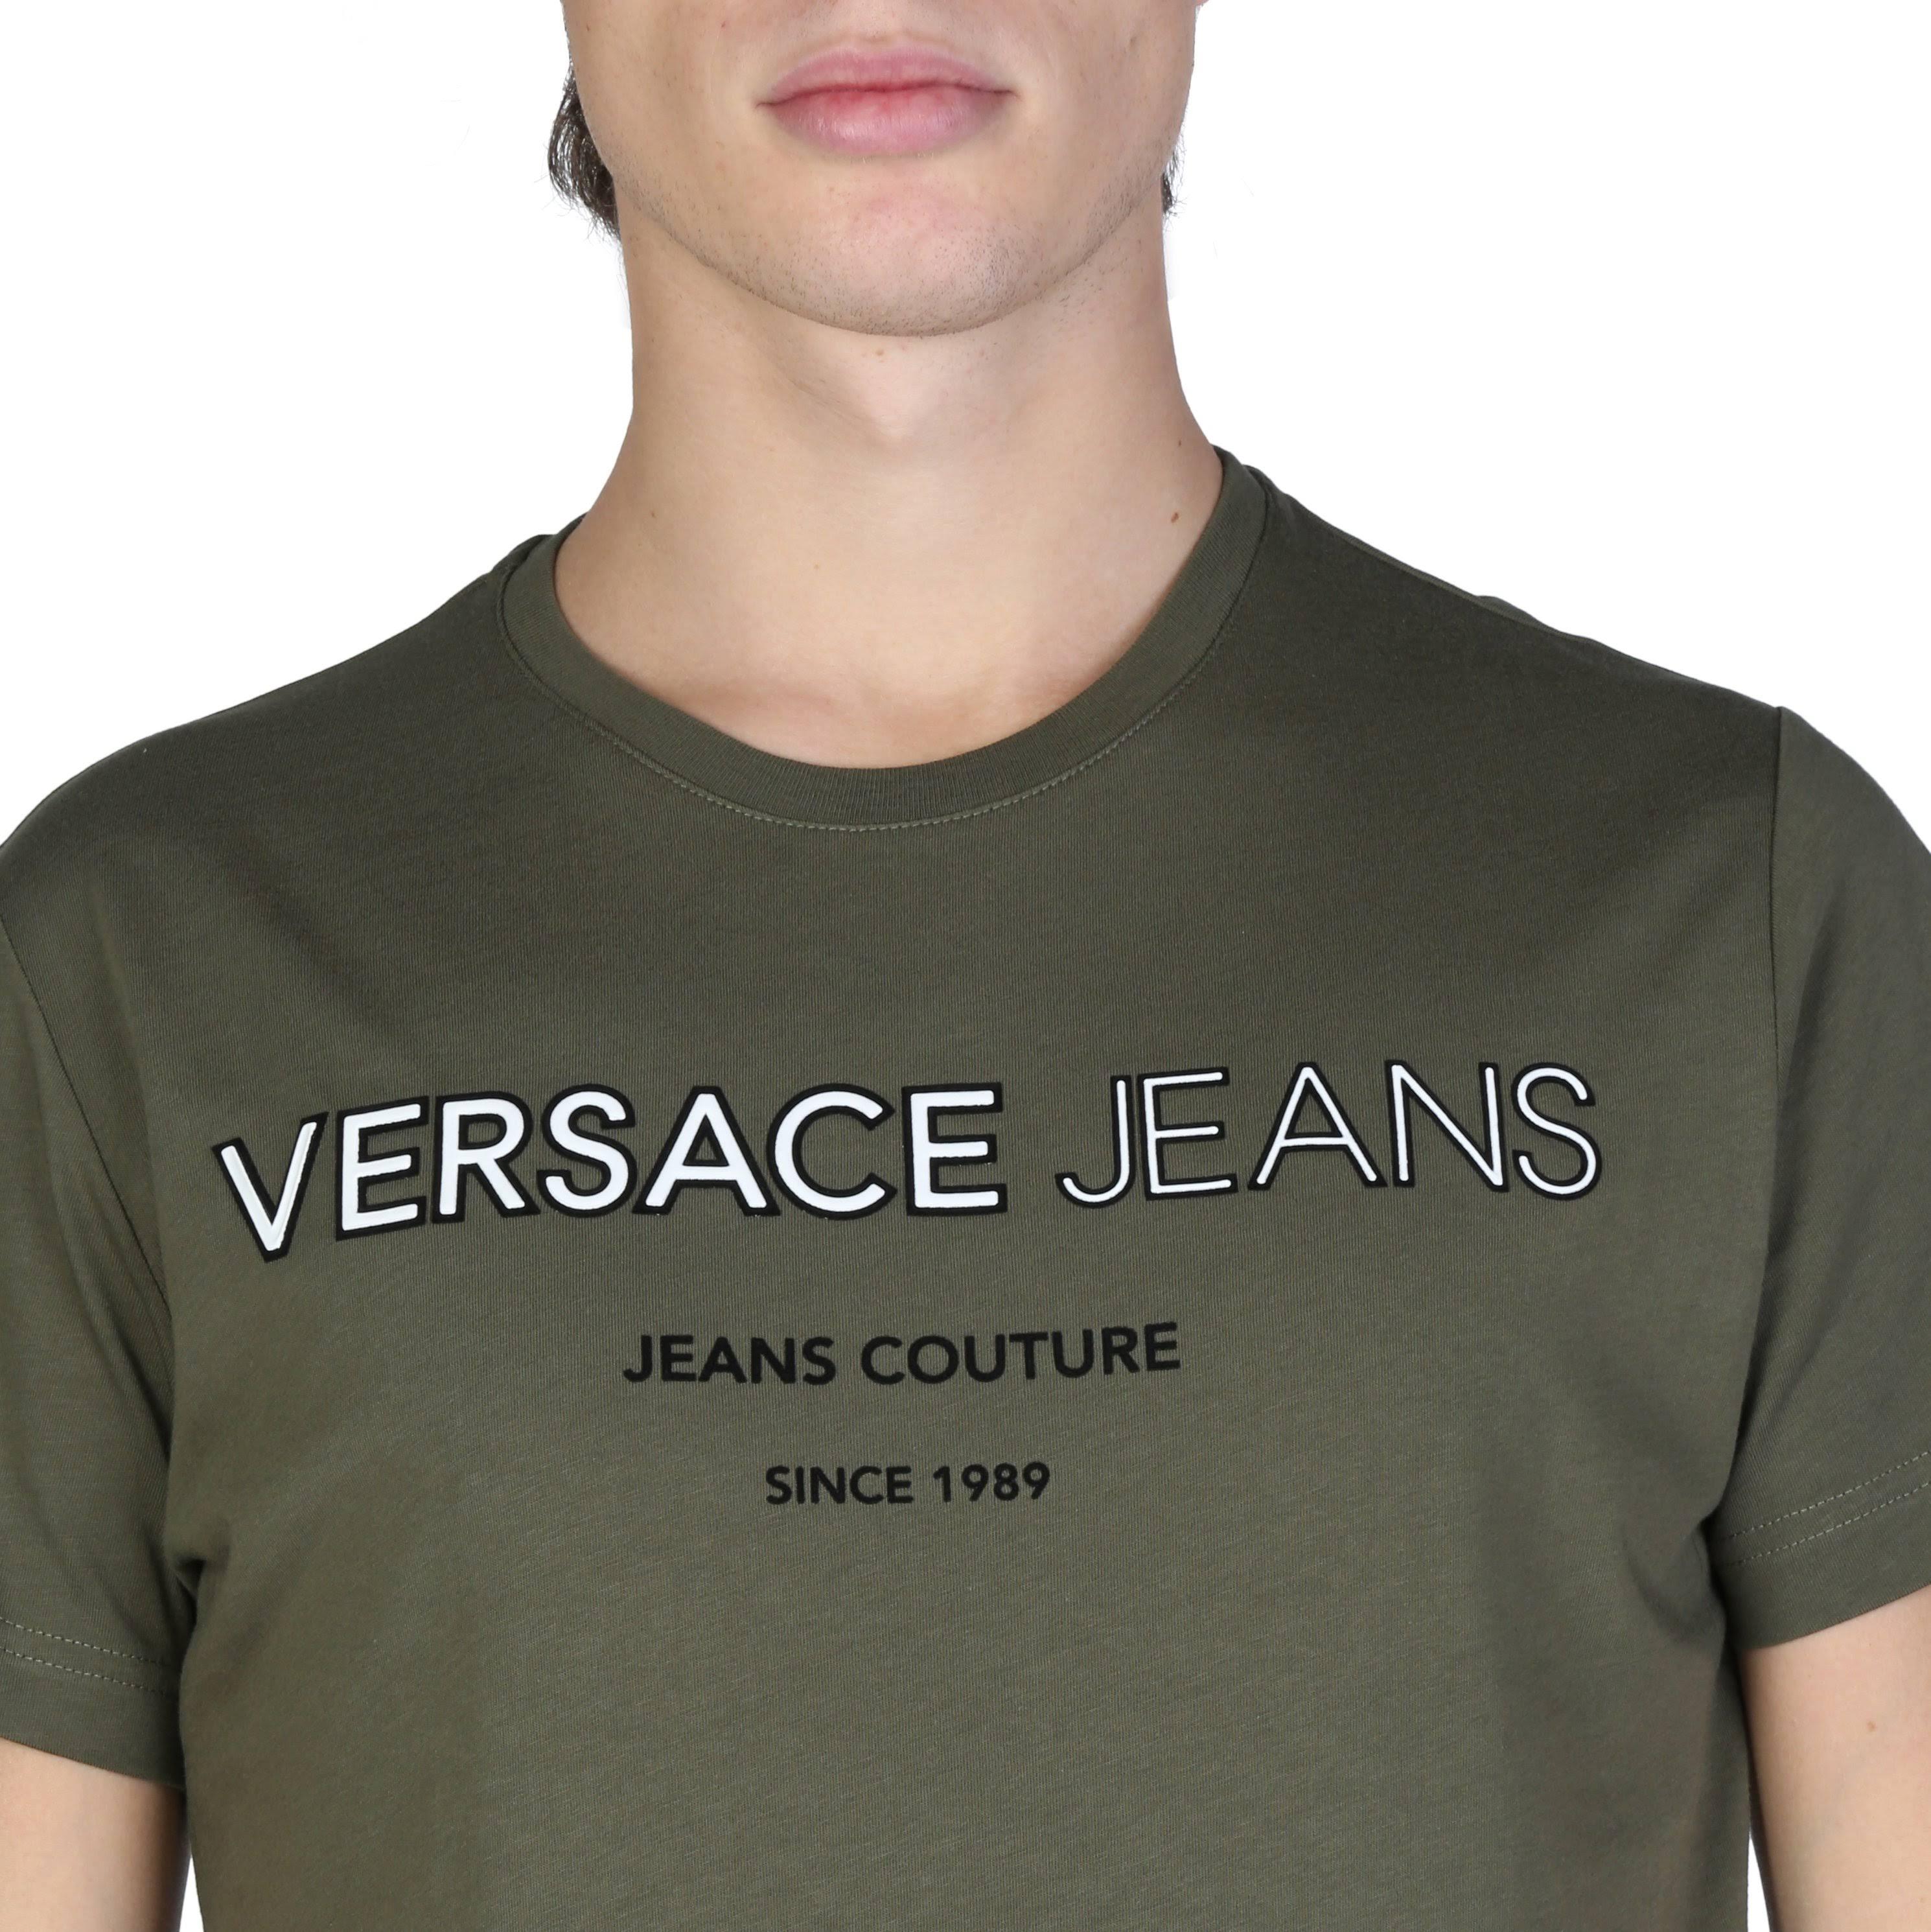 B3gsb71c Versace Jeans 36609 Jeans Xxl 36609 Versace B3gsb71c Versace Jeans Xxl wq00EpO6X